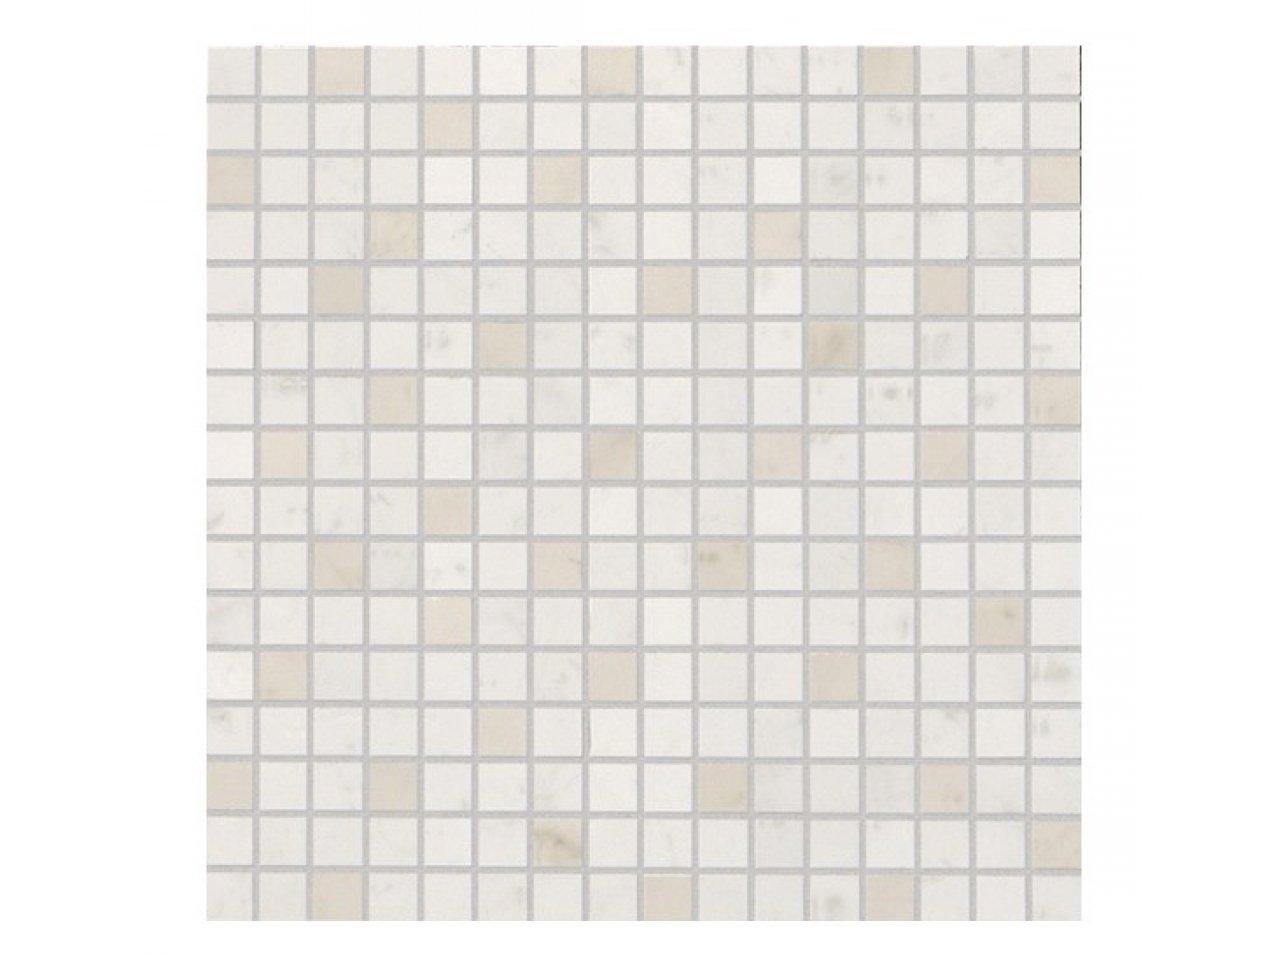 Мозаика FAP Roma Diamond Carrara Mosaico 30.5 x 30.5 см, Арт. fNH1